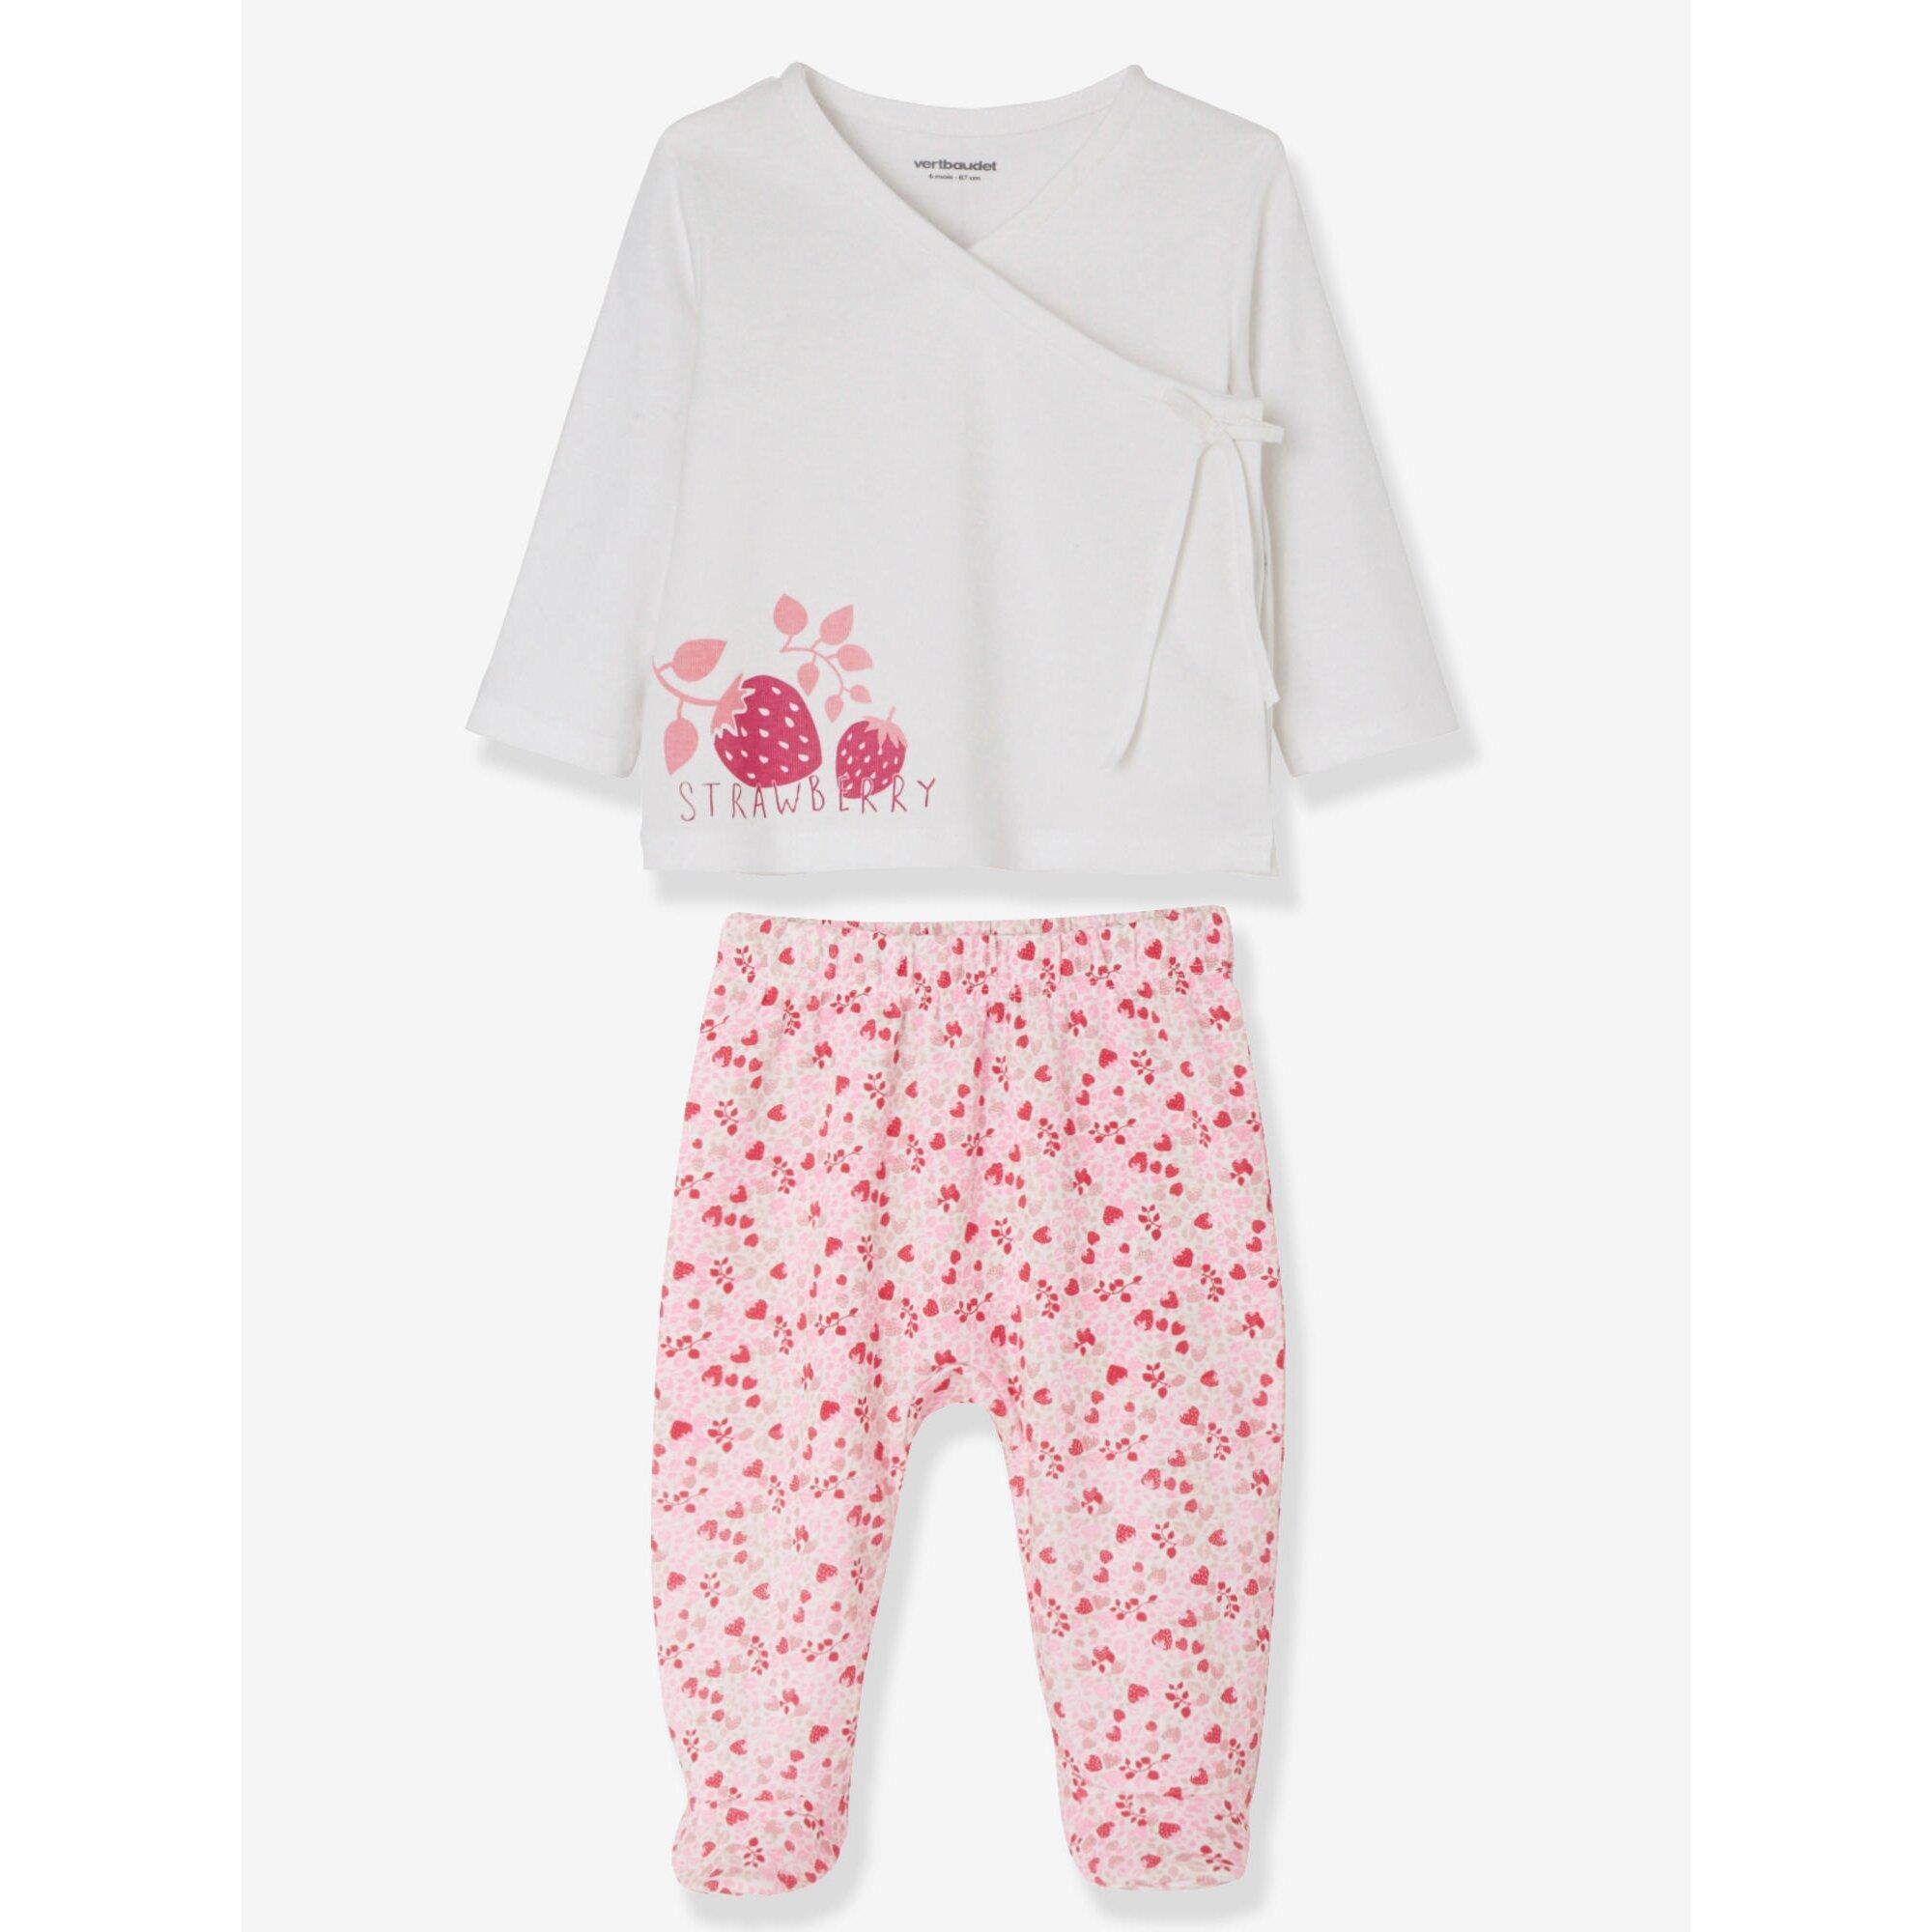 vertbaudet-2er-pack-baby-pyjamas-aus-baumwolle